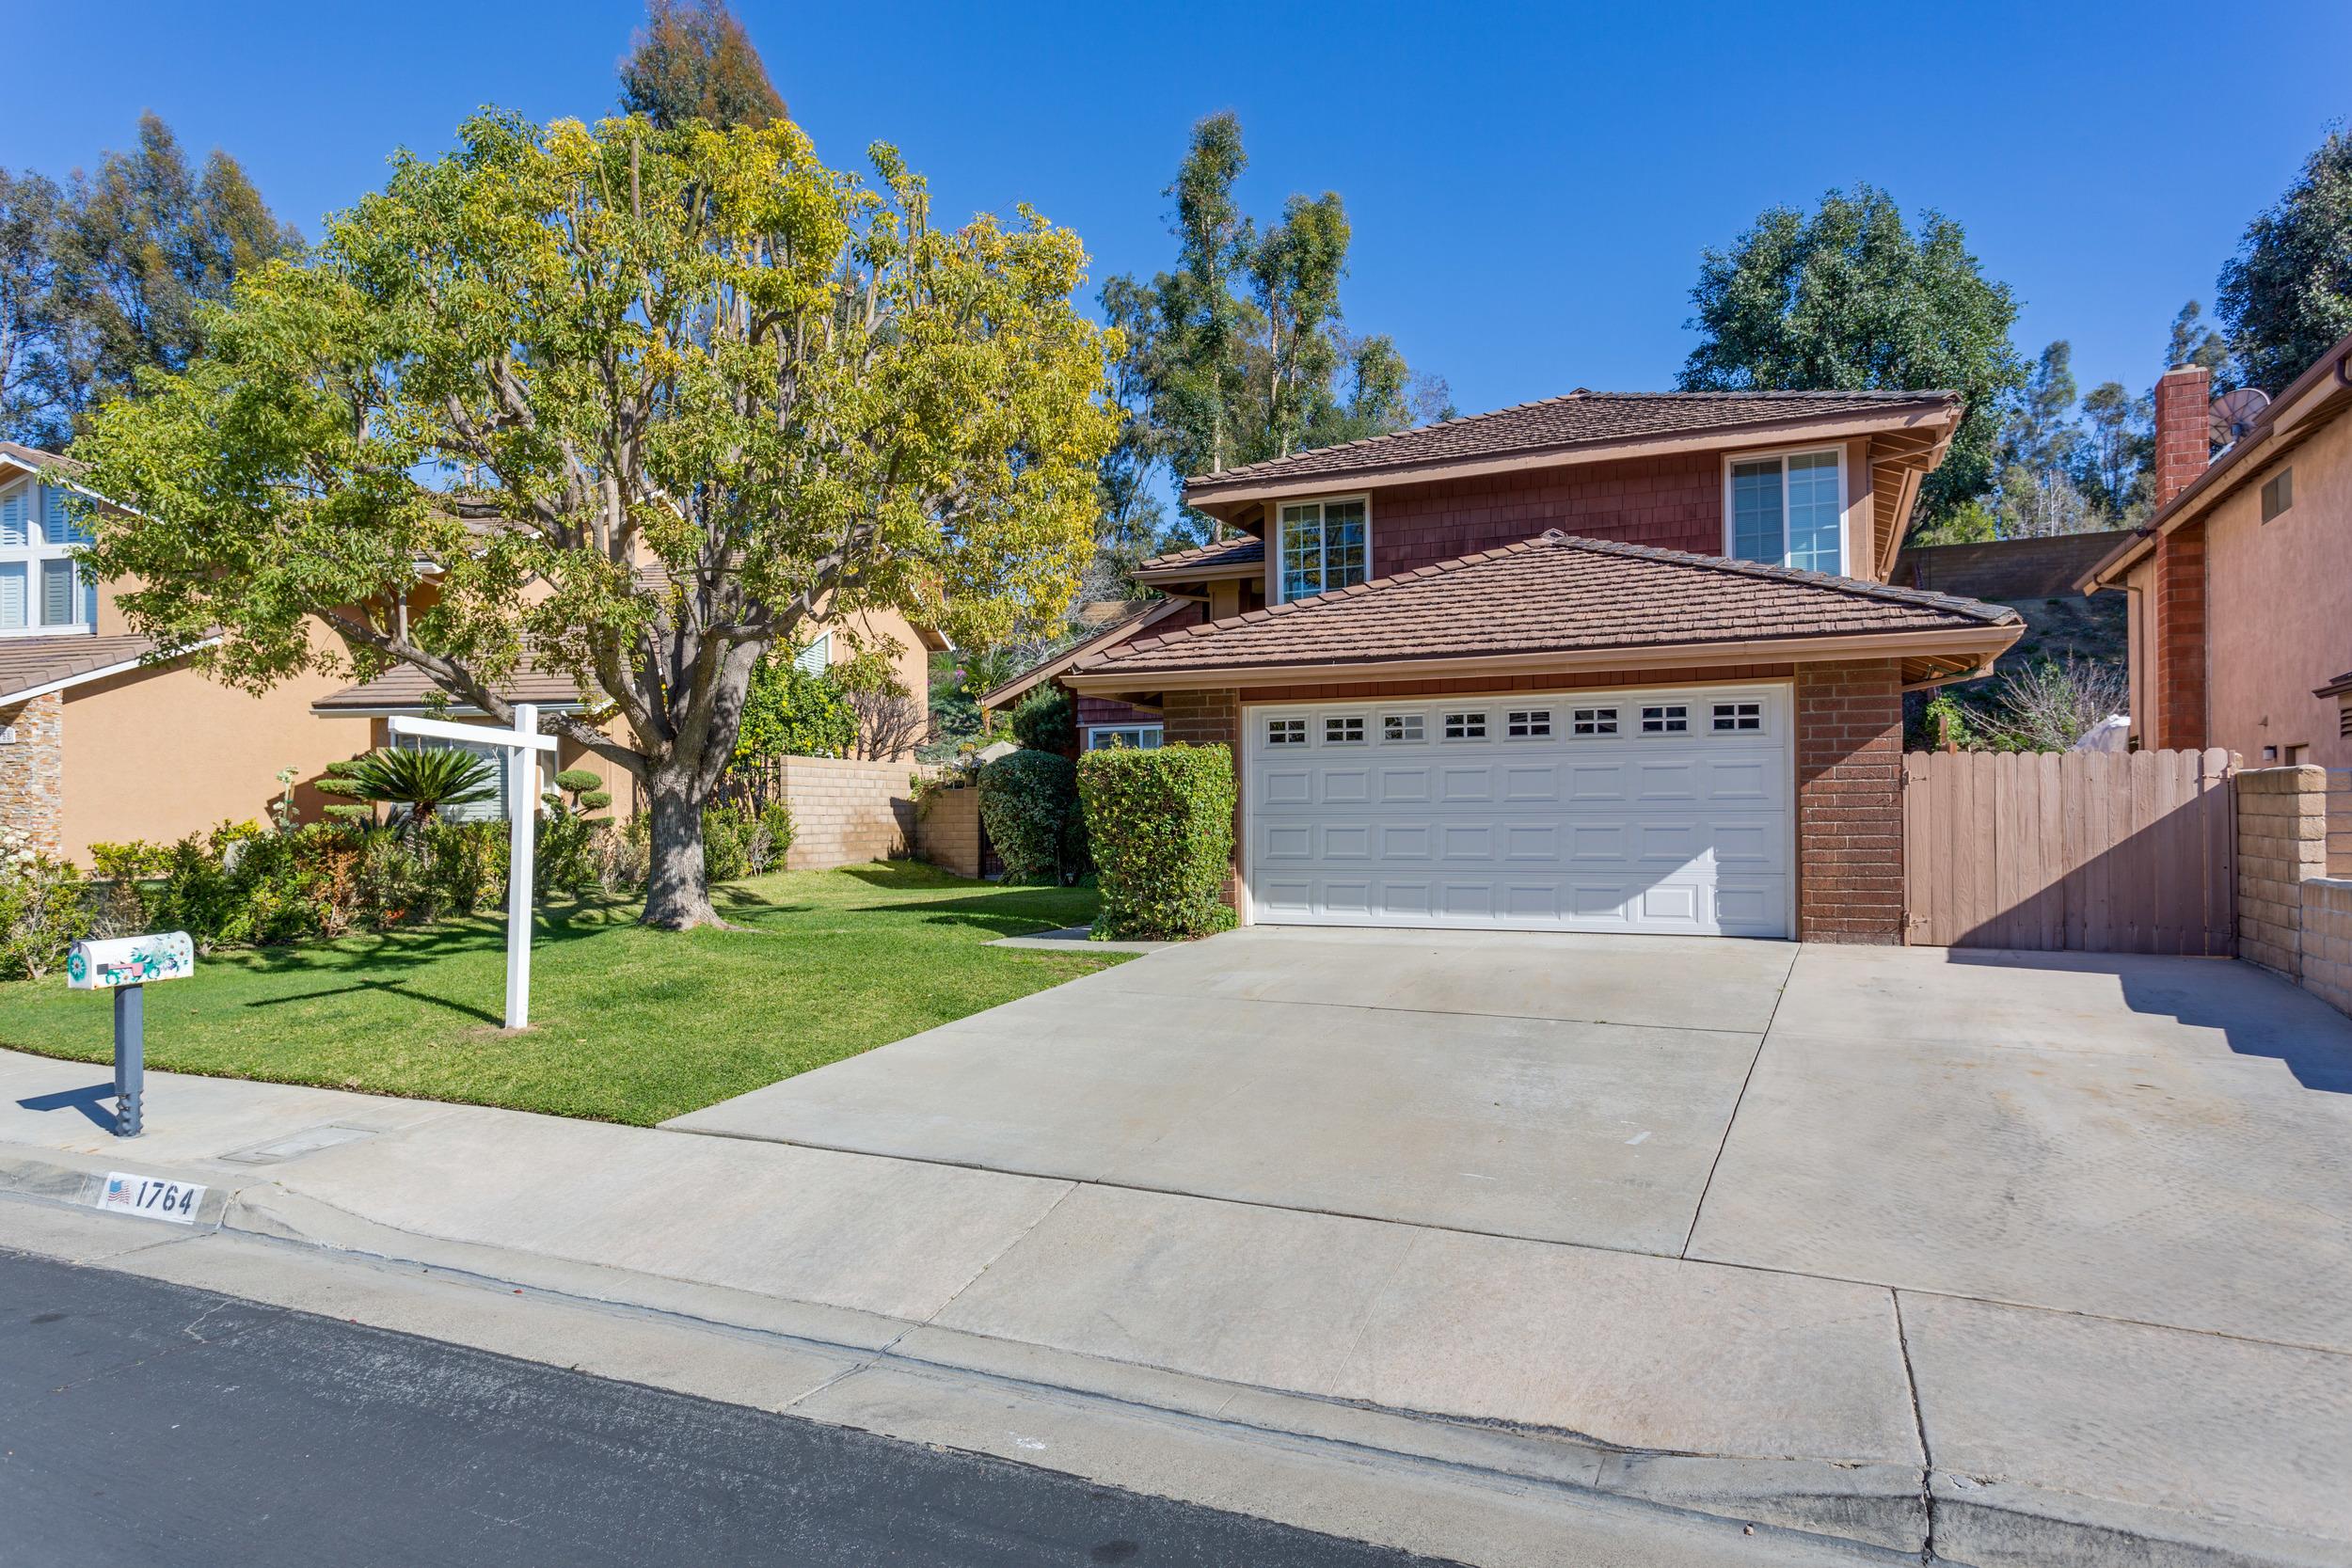 1764 Summerwood Ave fullerton, CA 92833  4 bed / 3 bath / 2,293 sq ft